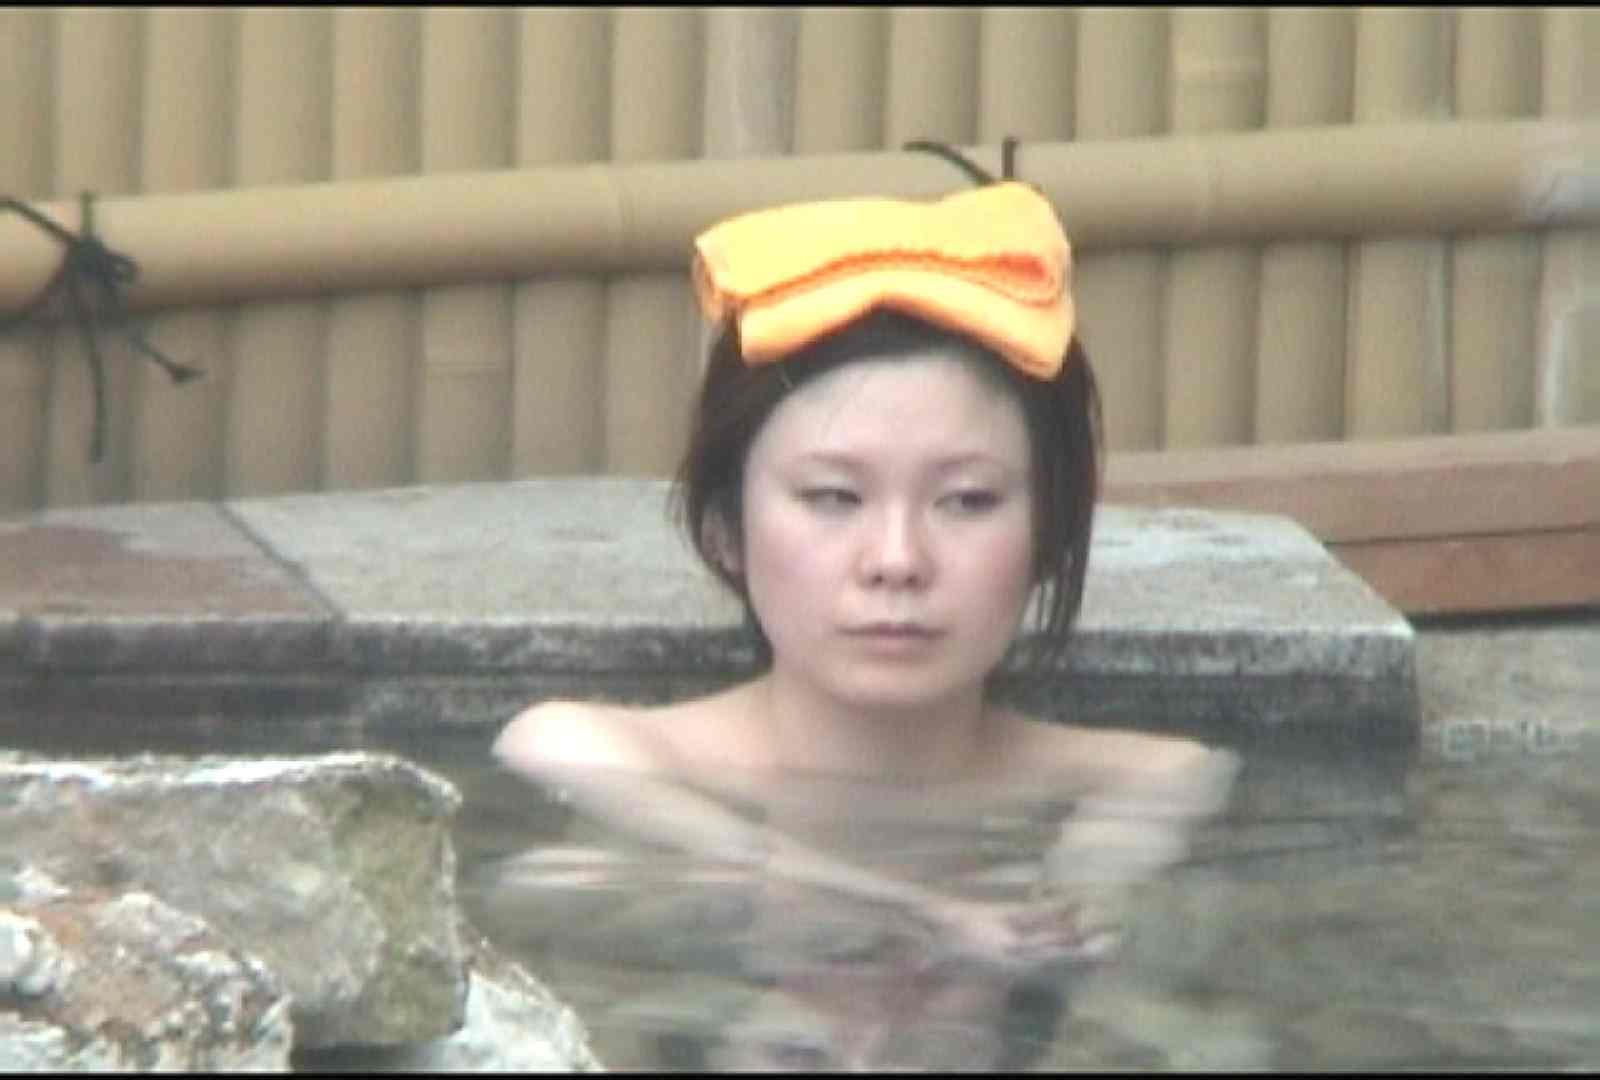 Aquaな露天風呂Vol.177 盗撮師作品  102pic 36